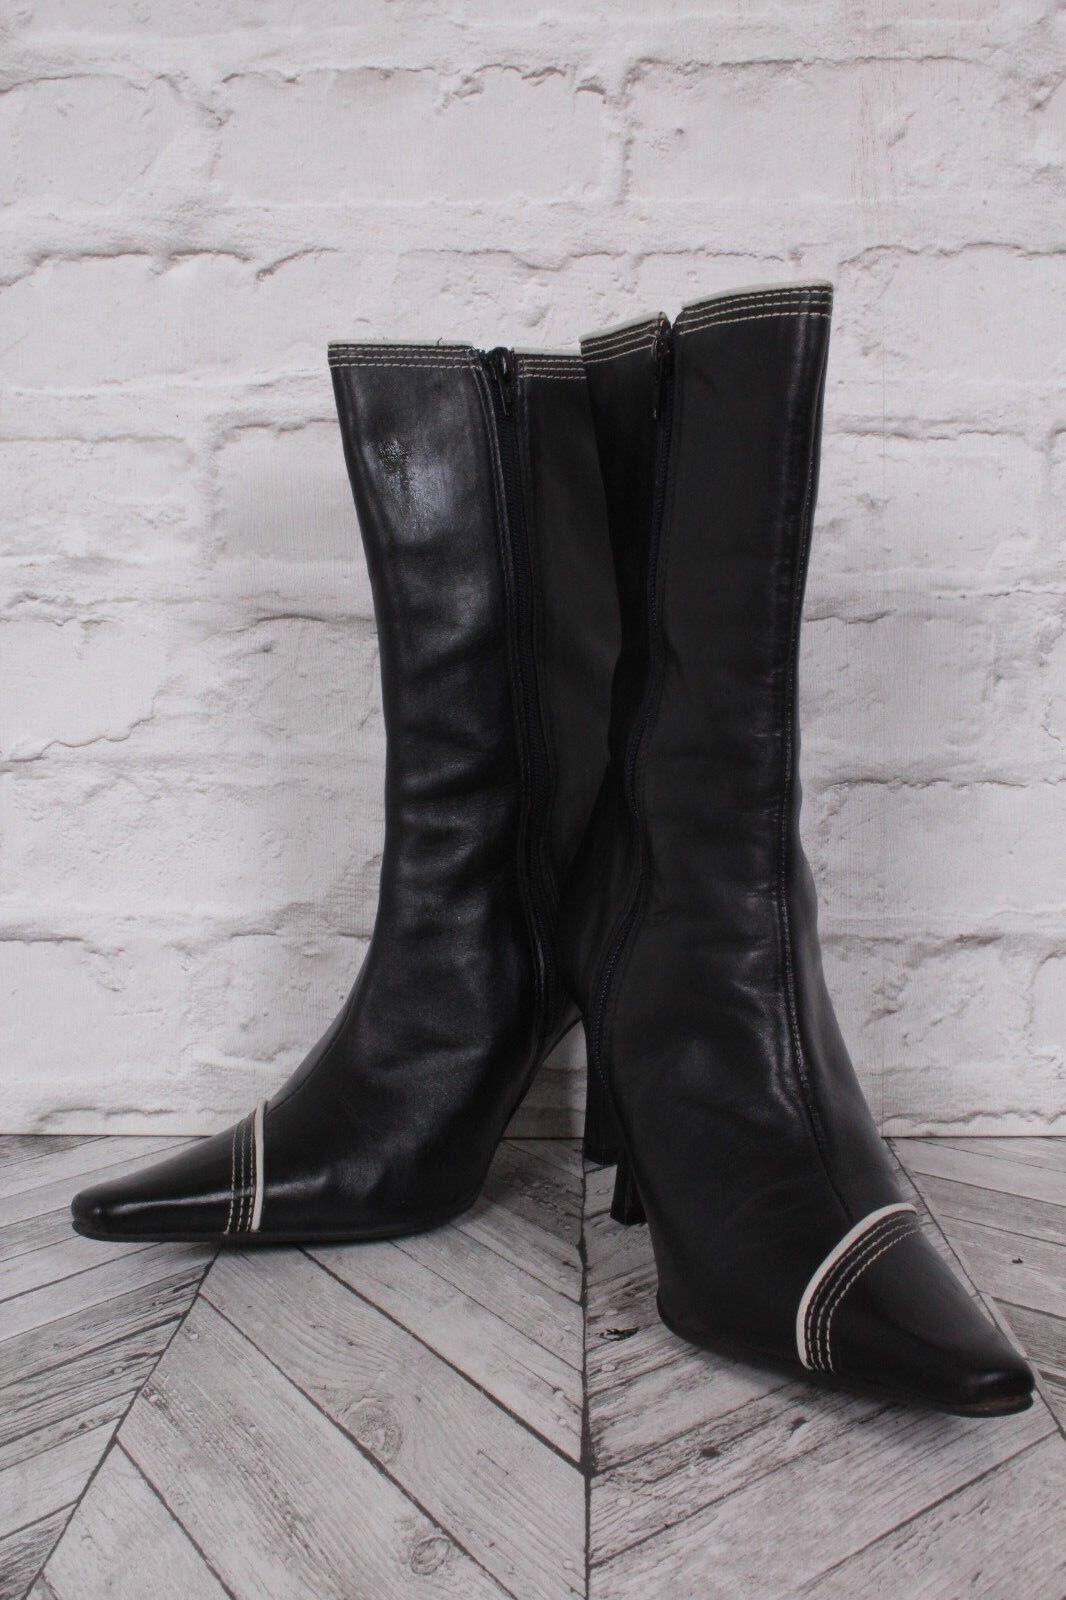 KALIKO   Black & Cream Leather Stiletto High Heel Mid Calf Boots  UK 7 41